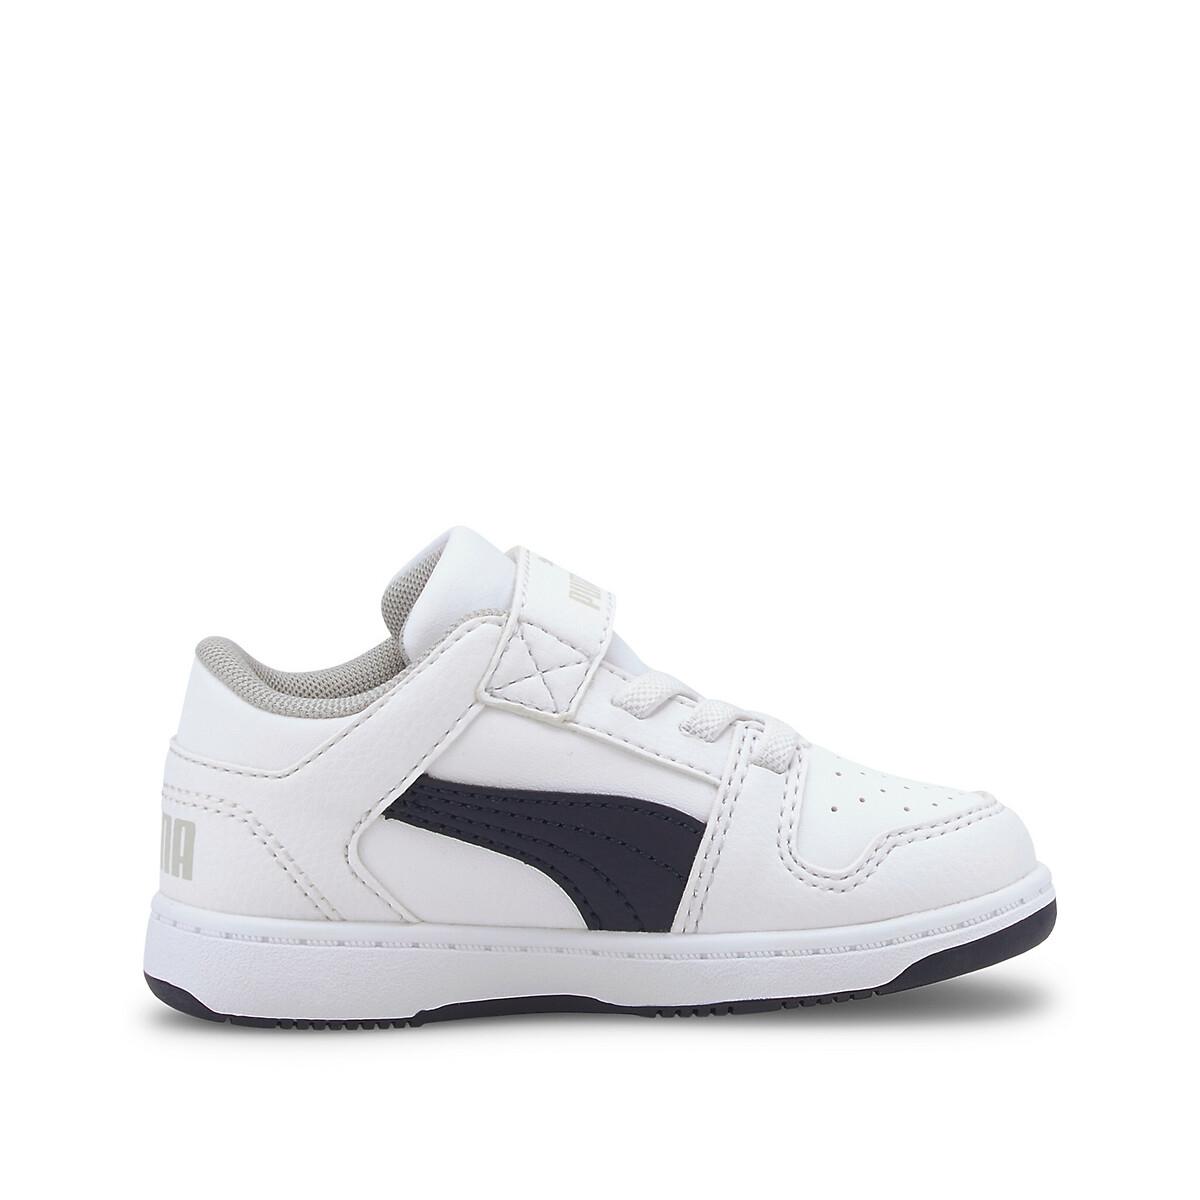 Puma Sneakers Rebound Layup Lo Sl V online kopen